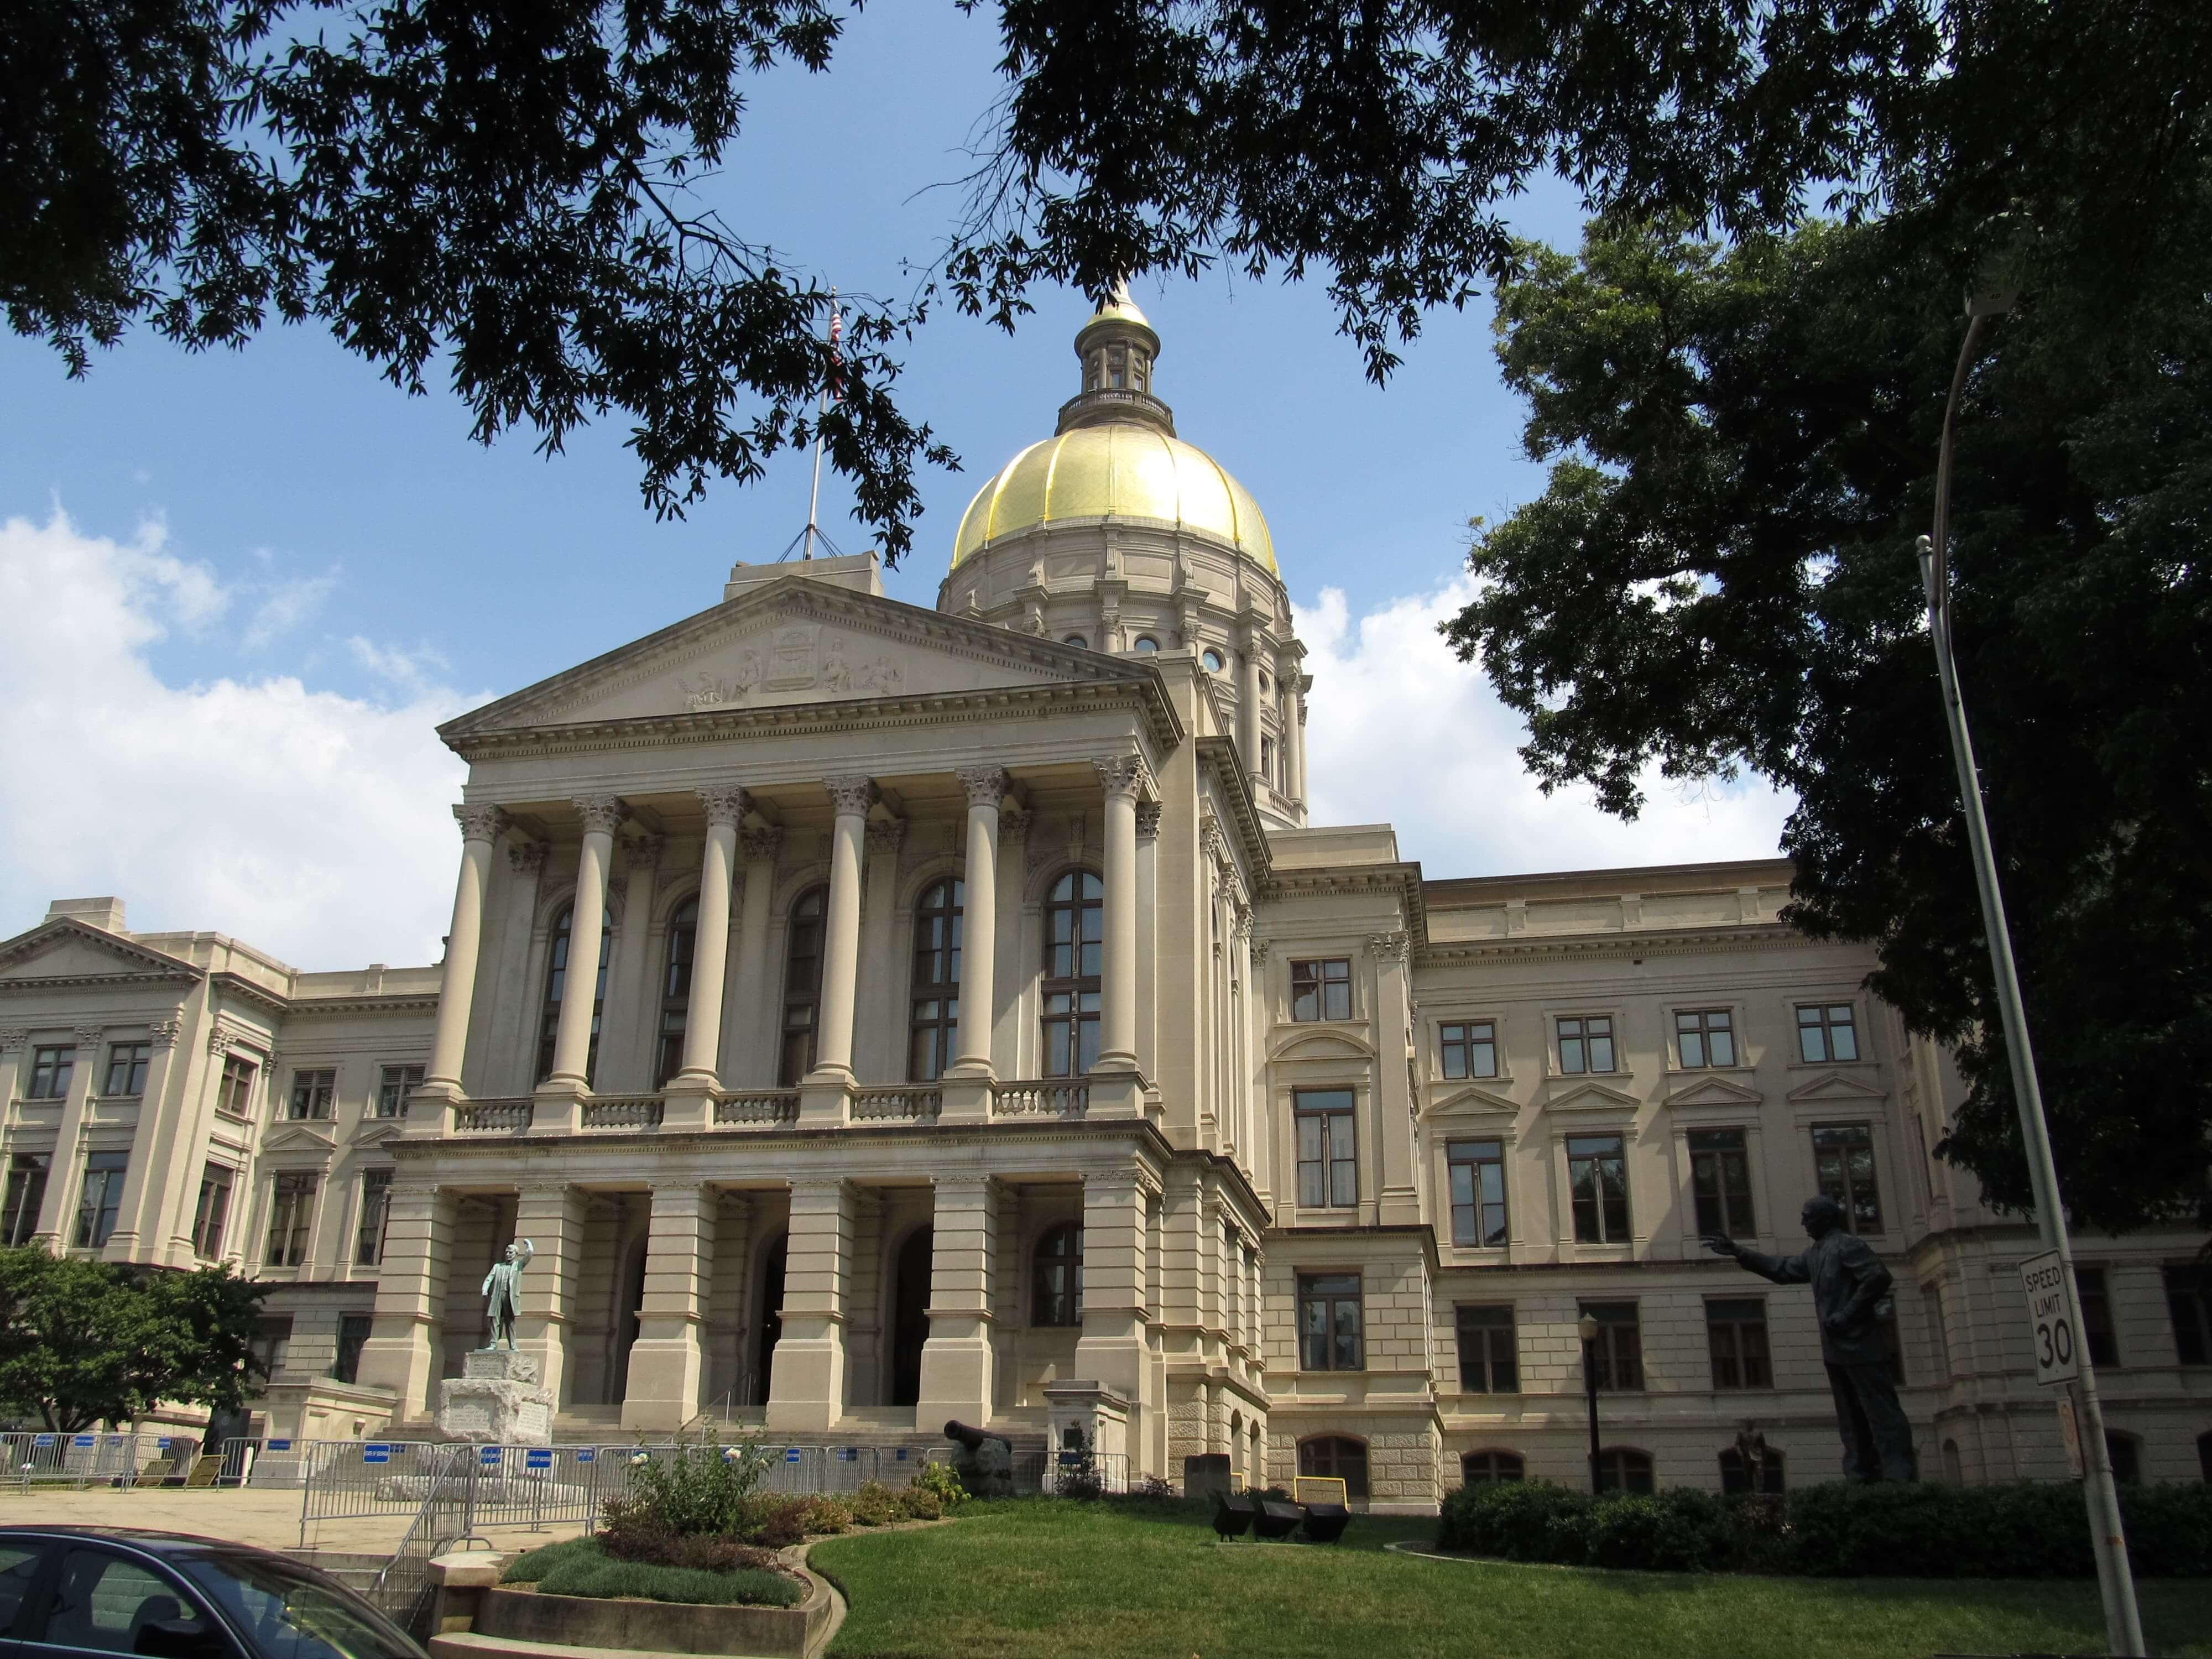 Georgia State Capitol in Atlanta, Georgia